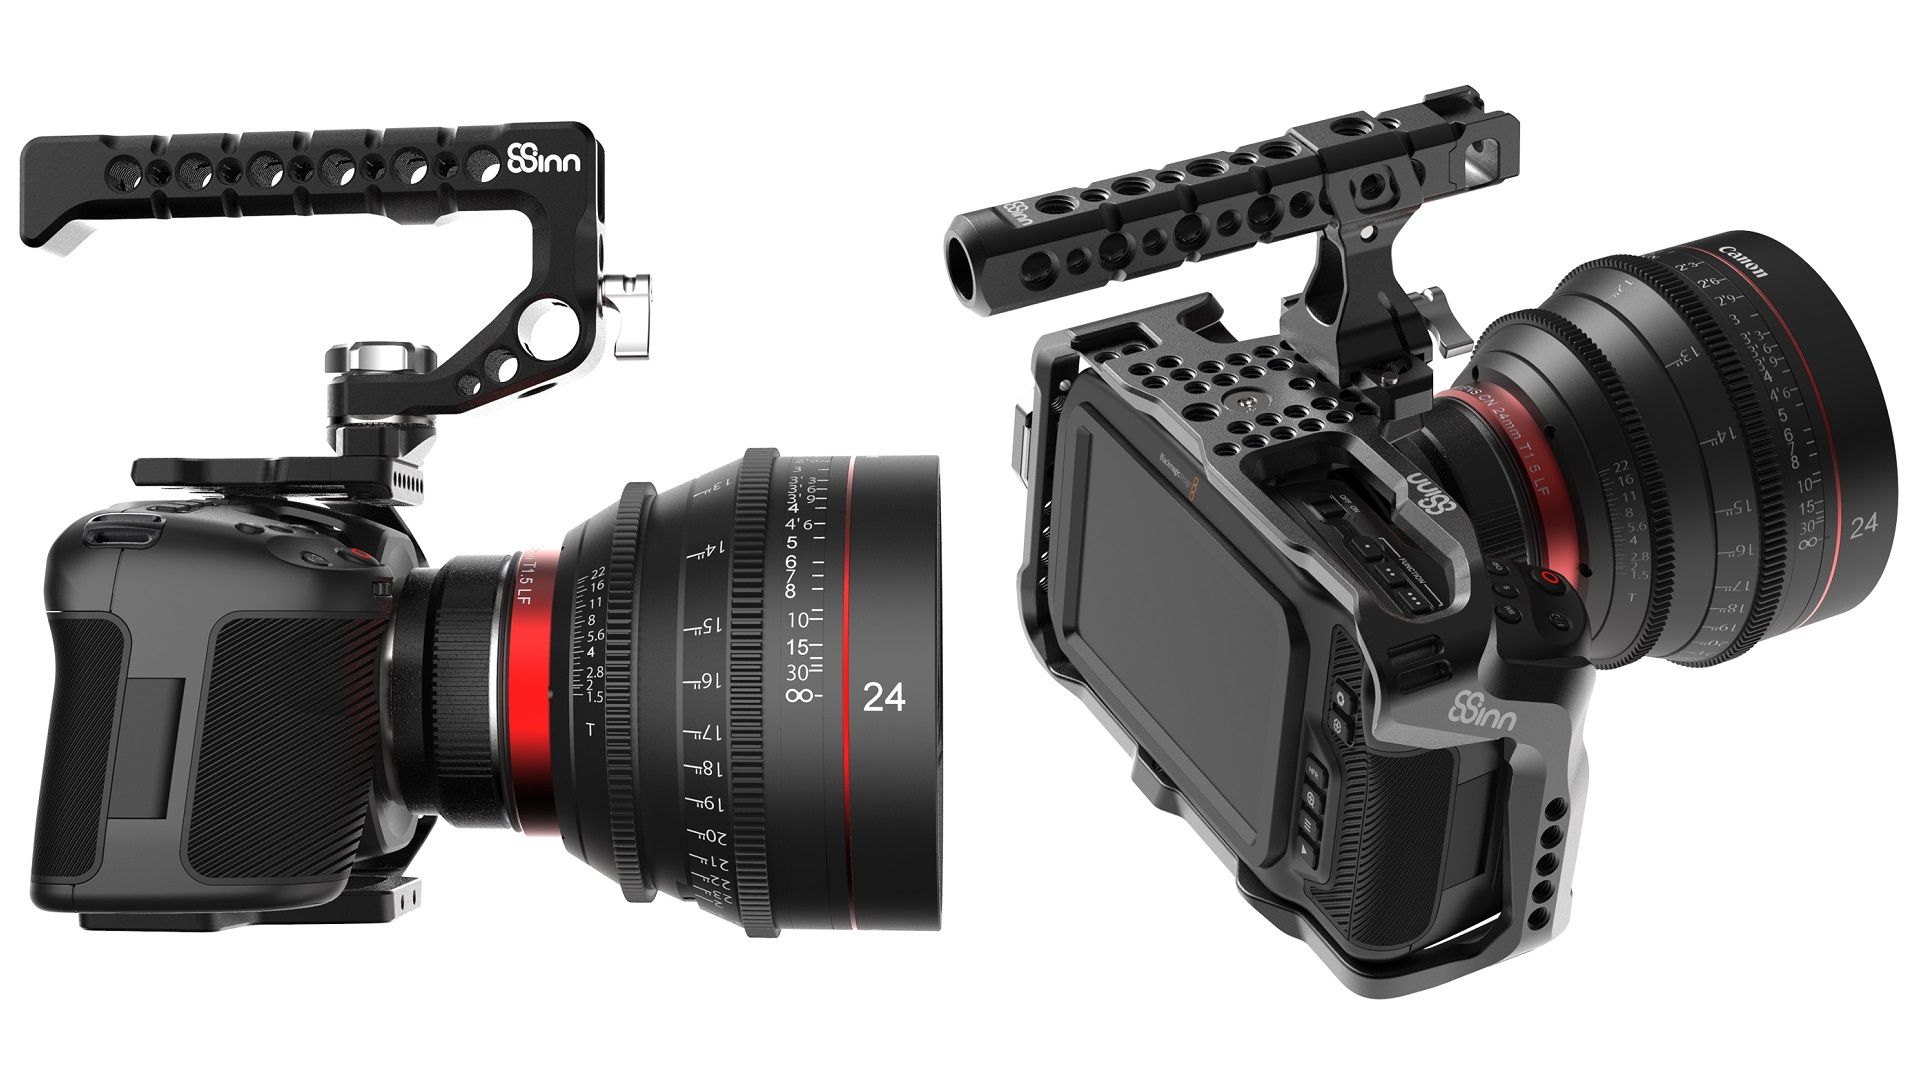 8sinnがブラックマジックデザインのpocket cinema camera 4k用のケージを